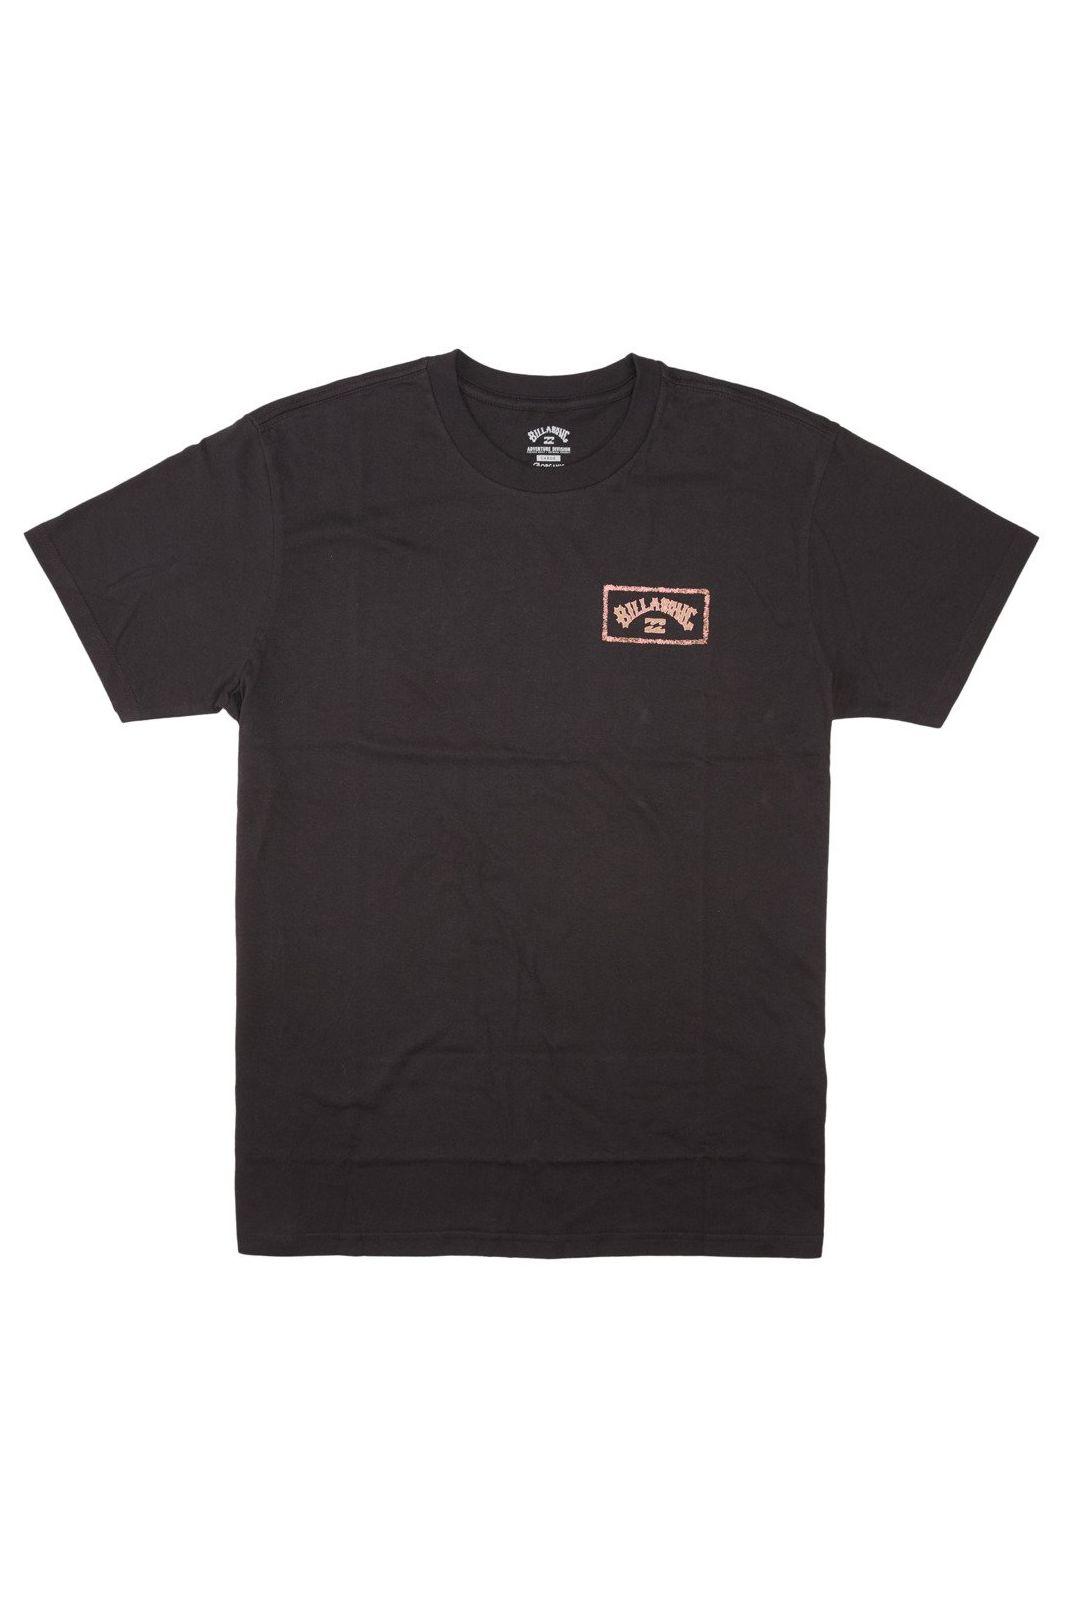 T-Shirt Billabong ARCH ADIV SS ADVENTURE DIVISION Black